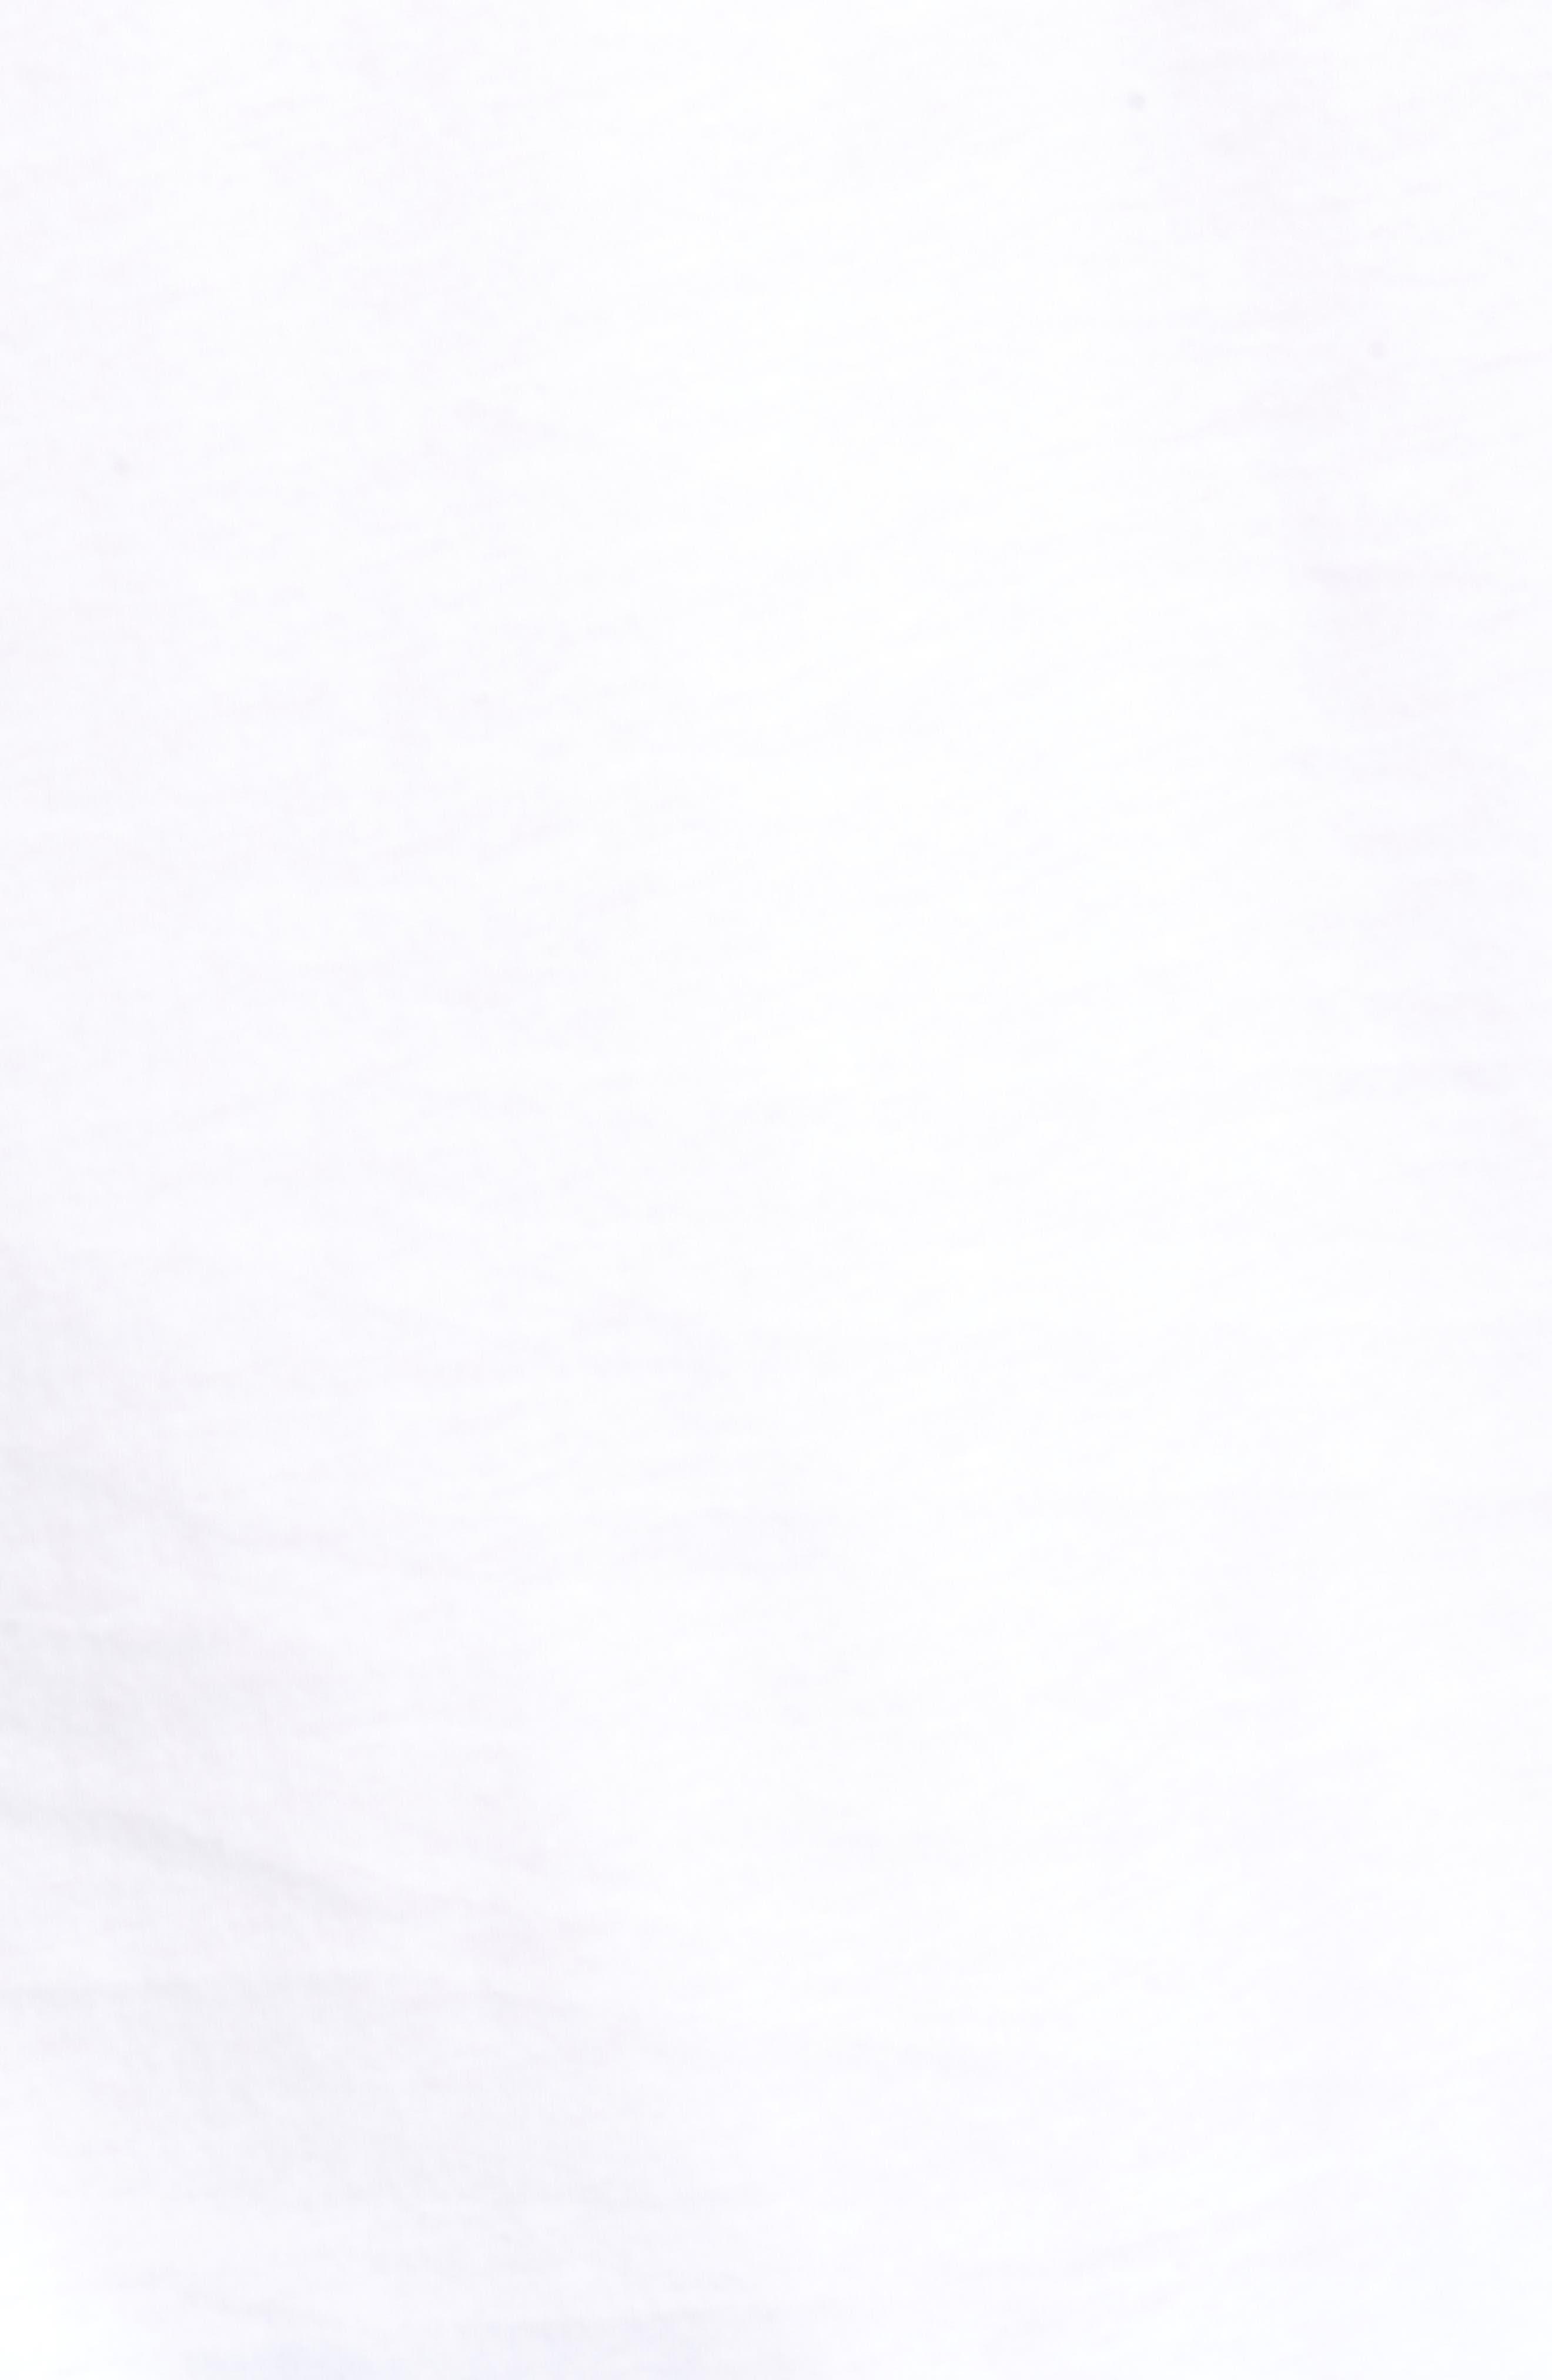 Polo Ralph Lauren 3-Pack Slim Fit V-Neck T-Shirts,                             Alternate thumbnail 6, color,                             WHITE